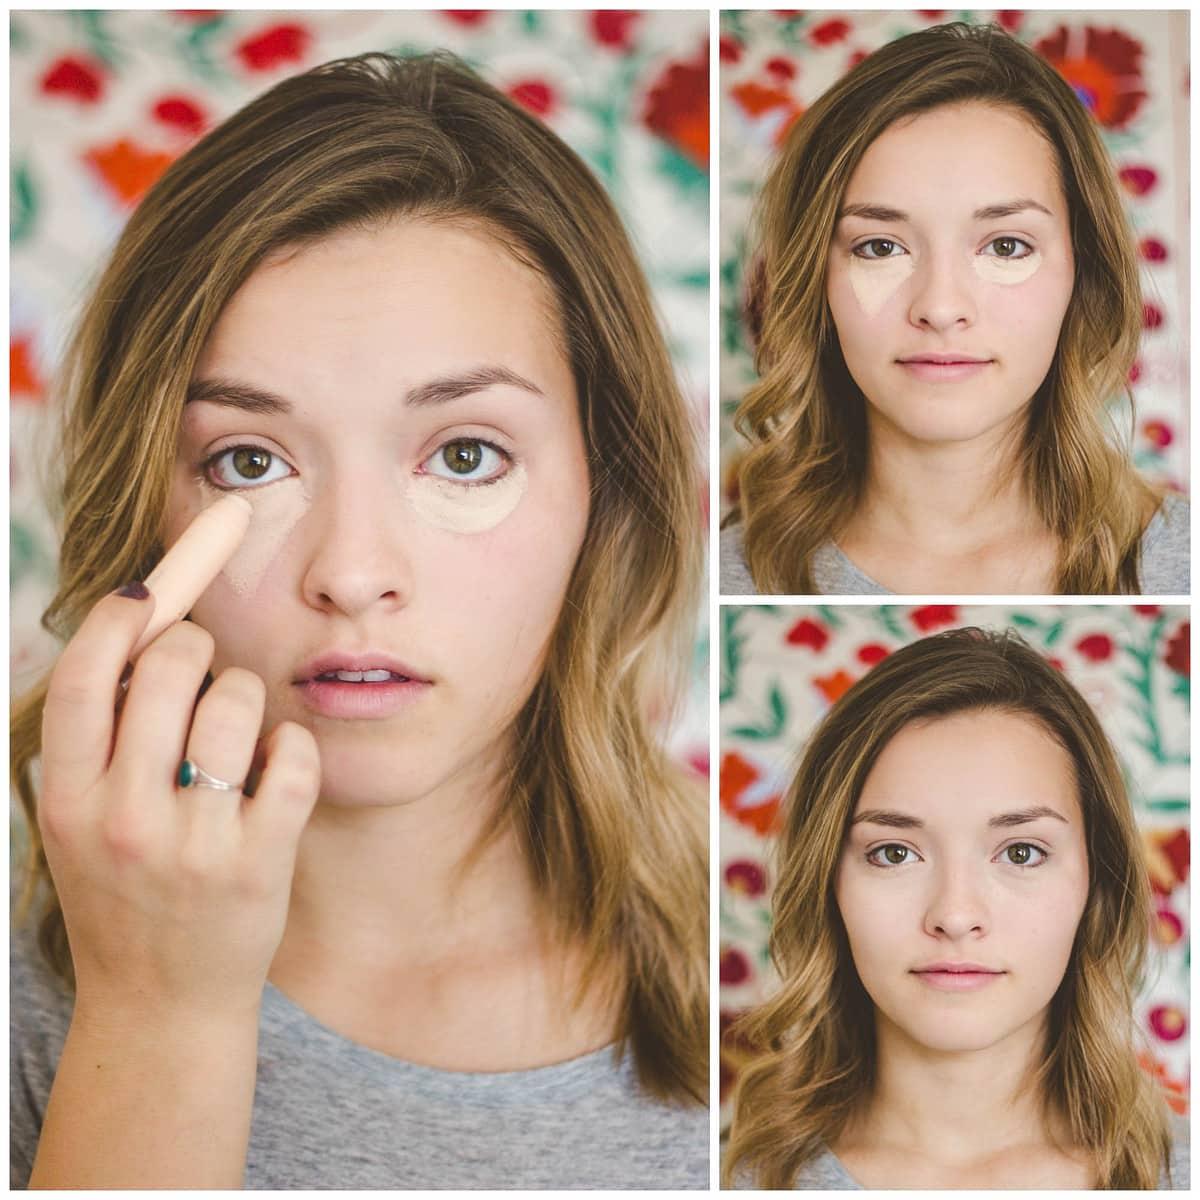 Tried and True Makeup Hacks - cover dark eyes by creating a triangle shape instead of a circular shape underneath the eye! { lilluna.com }